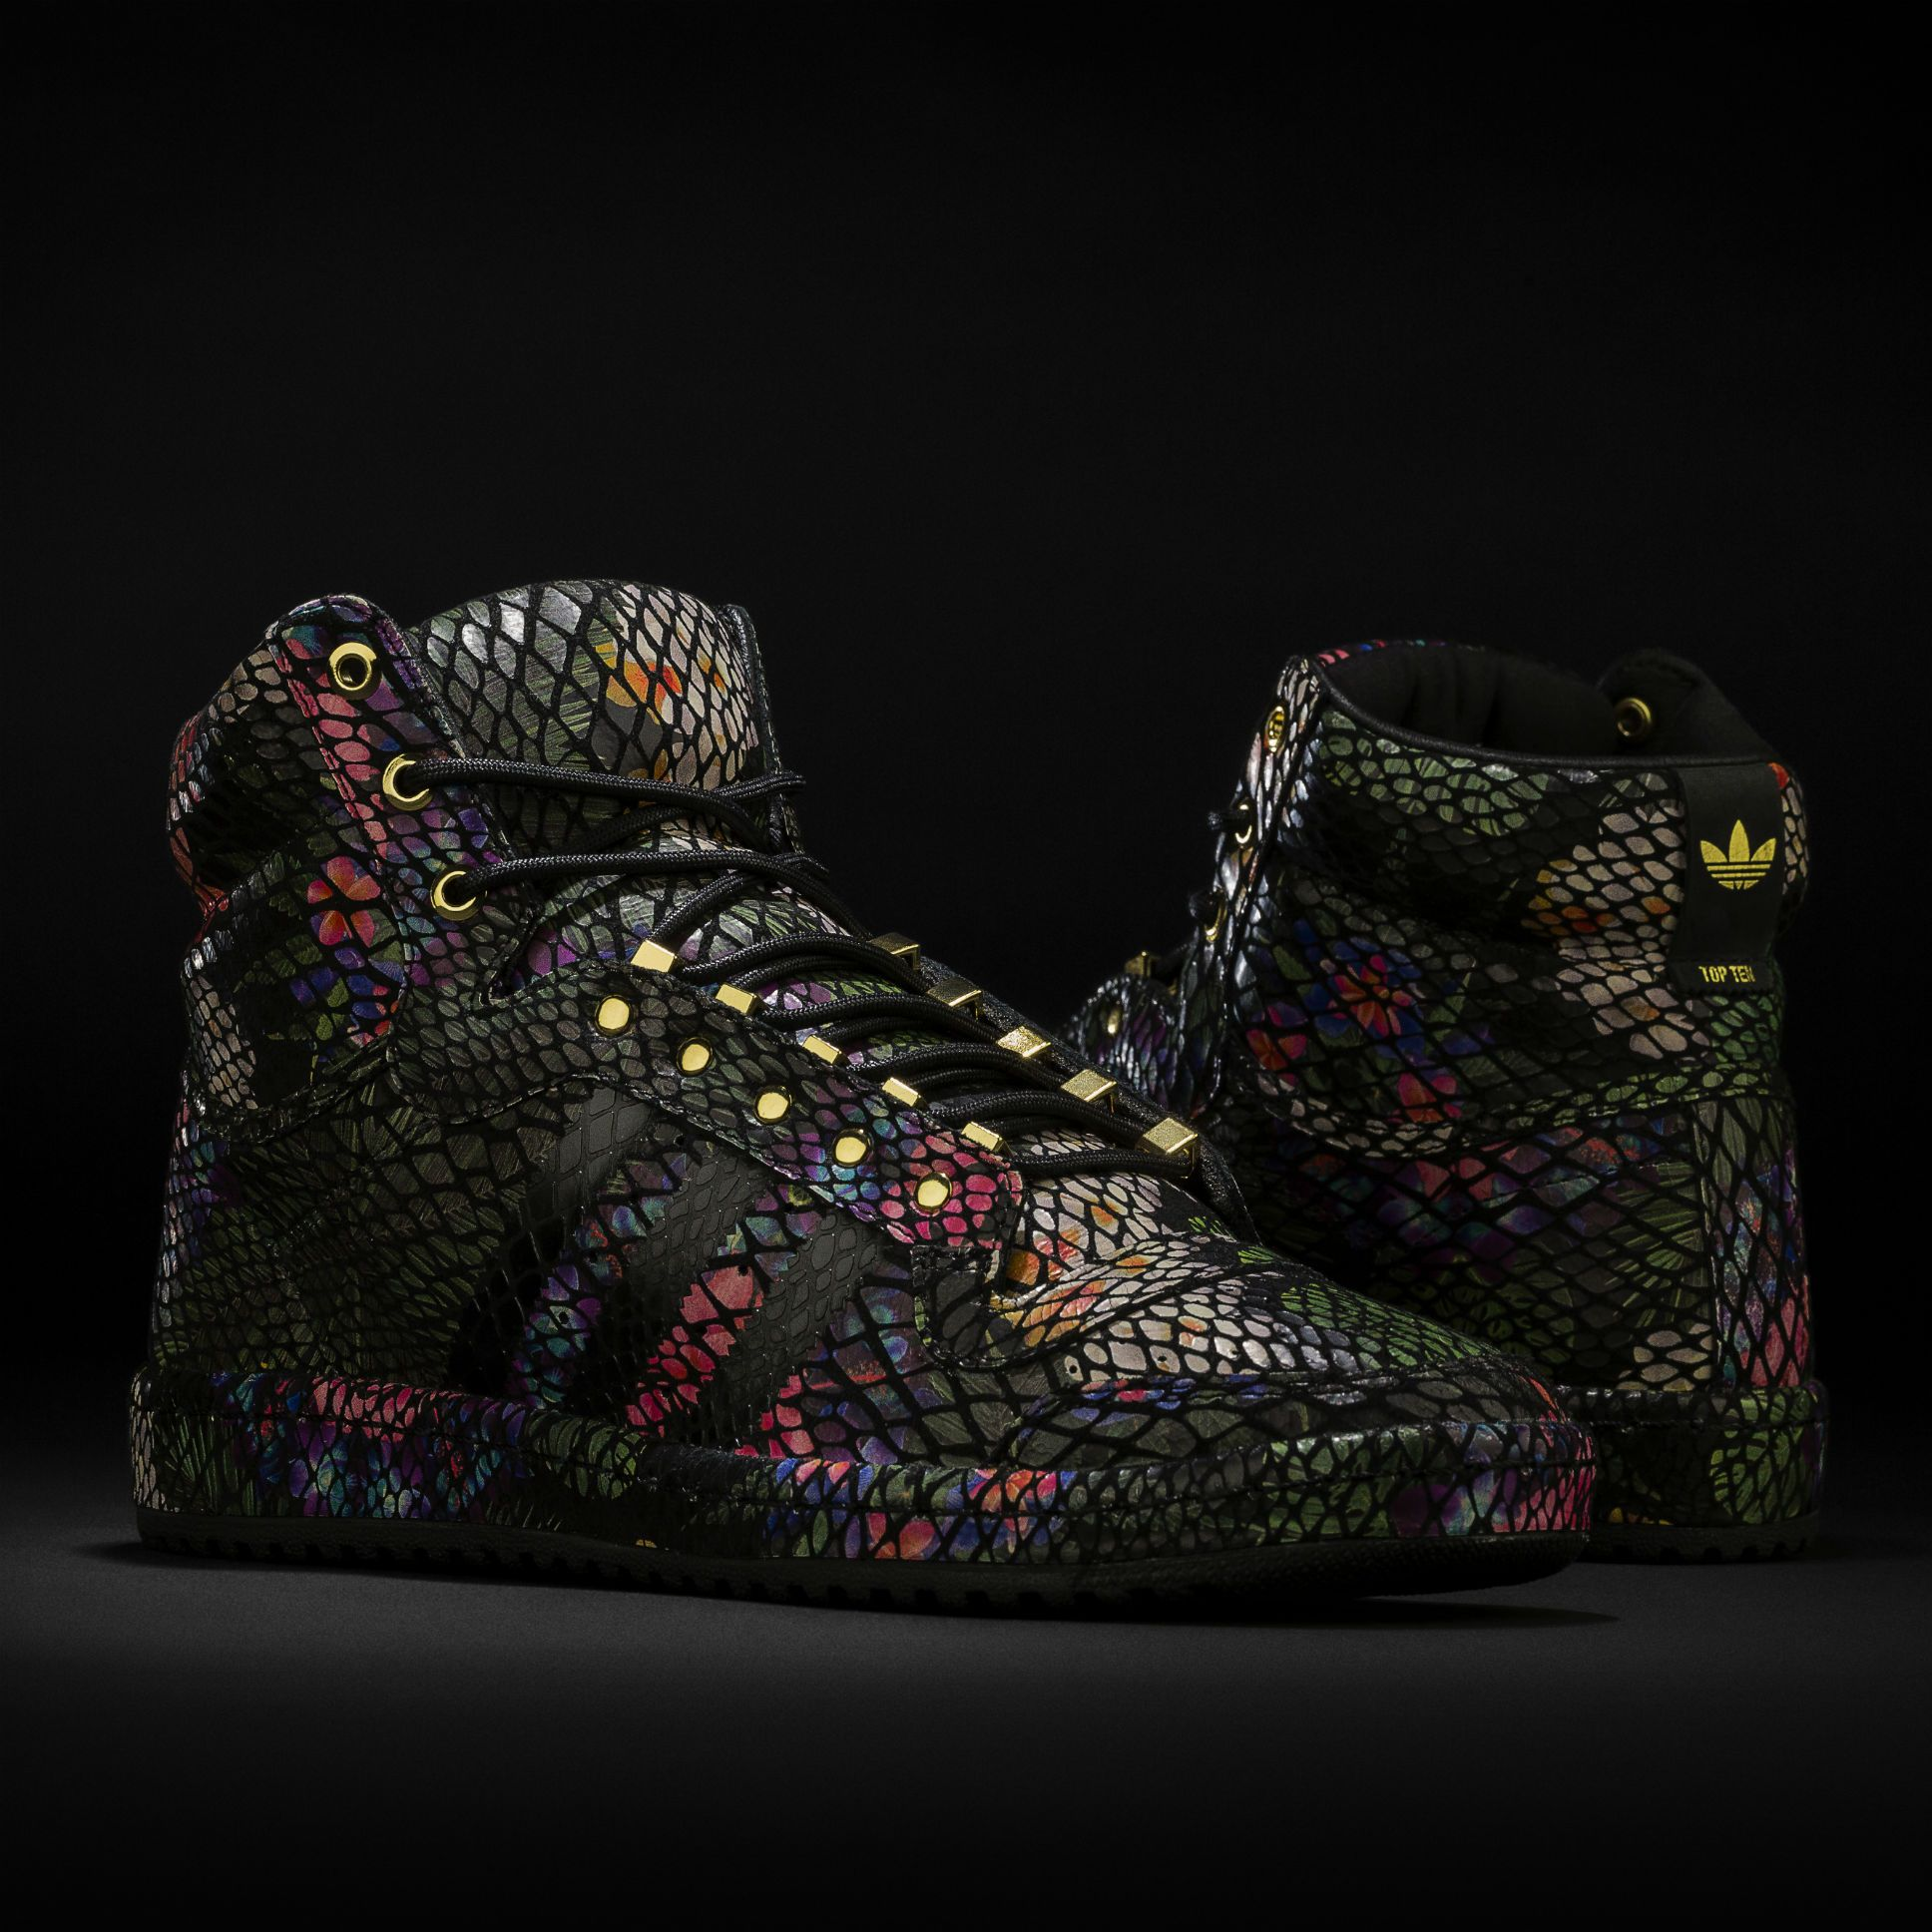 This week's #kickoftheweek: the #adidasOriginals Micropacer